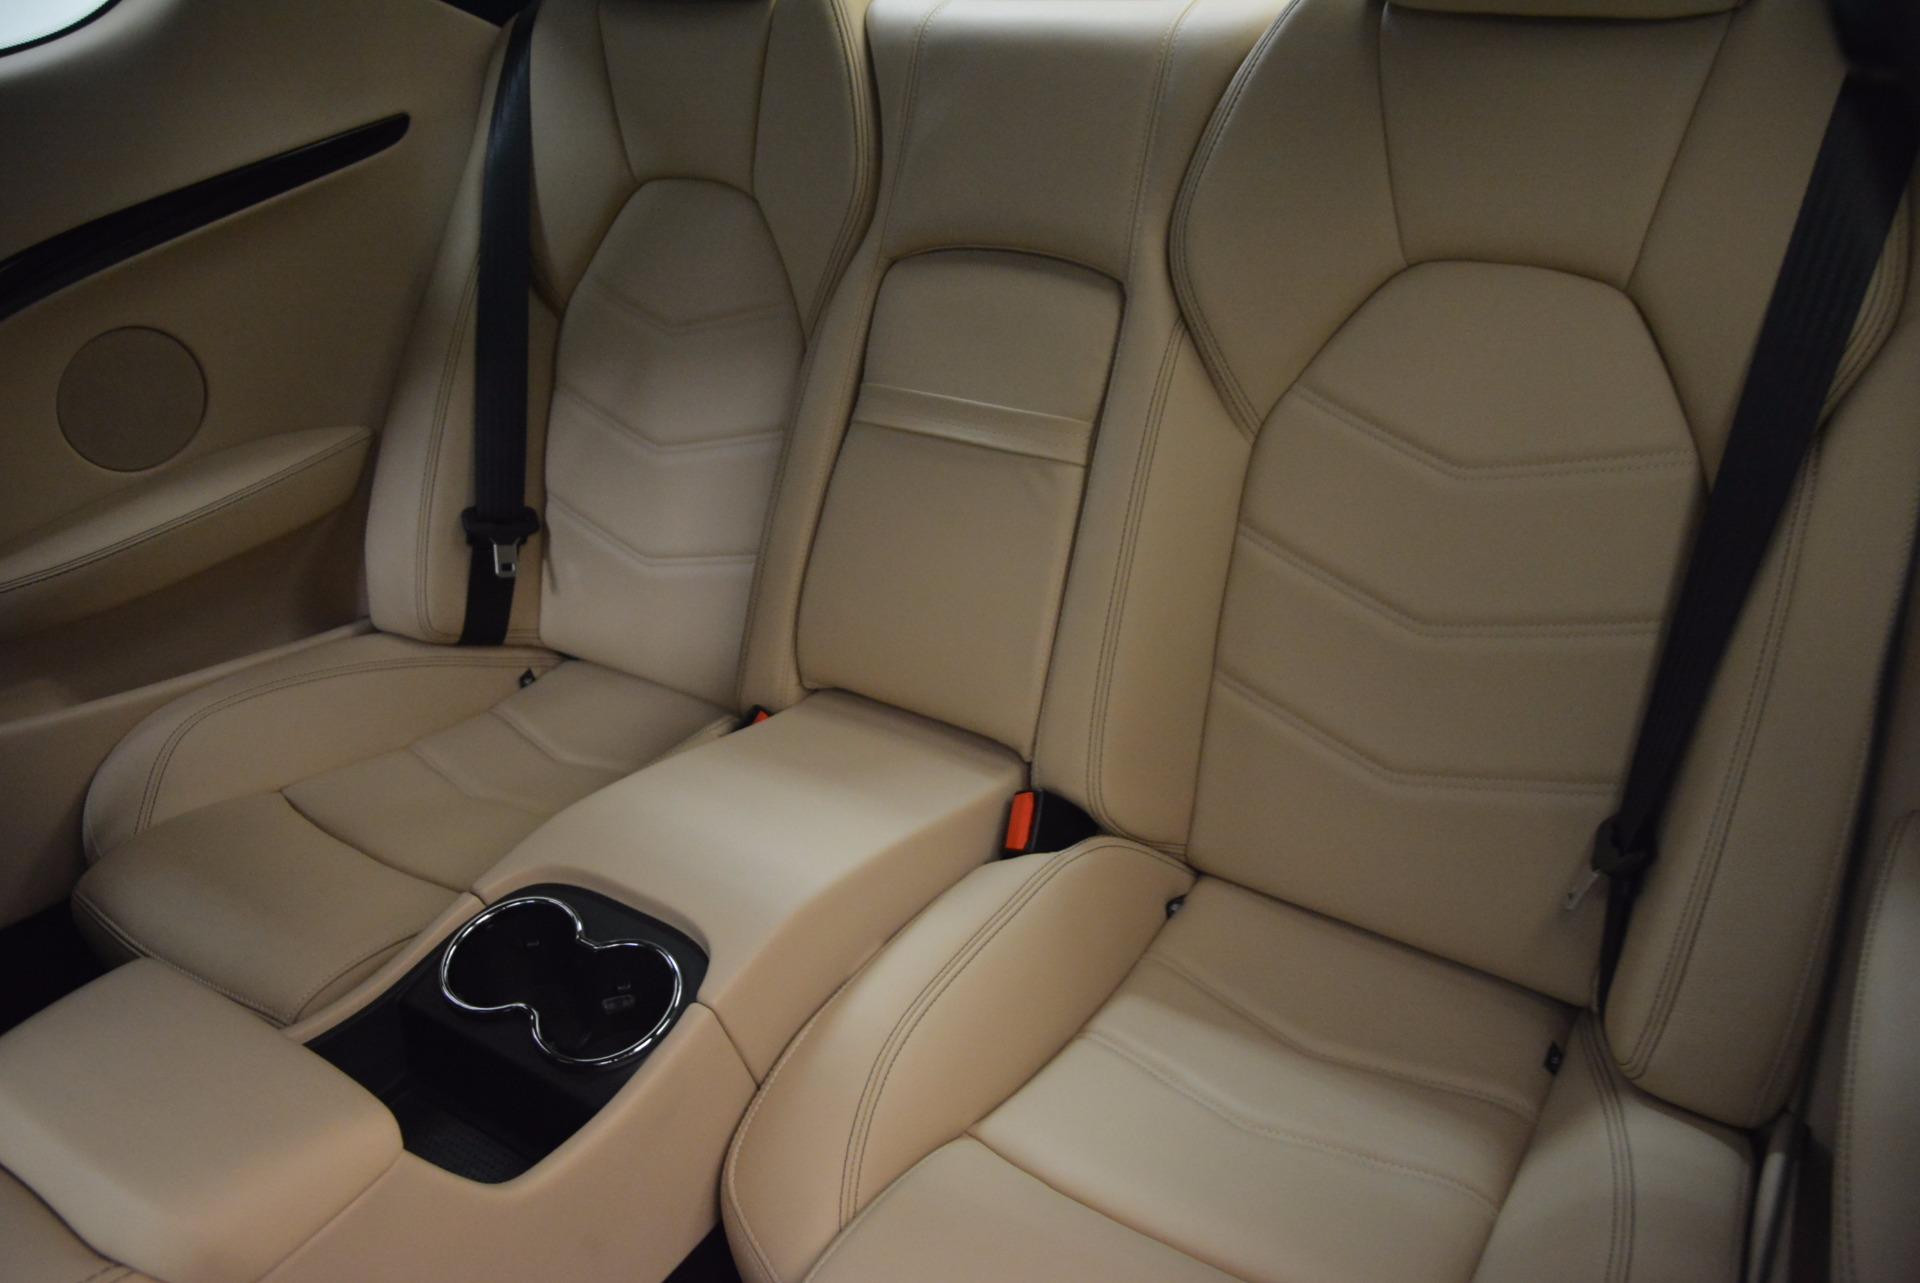 Used 2015 Maserati GranTurismo Sport Coupe For Sale In Westport, CT 1557_p16